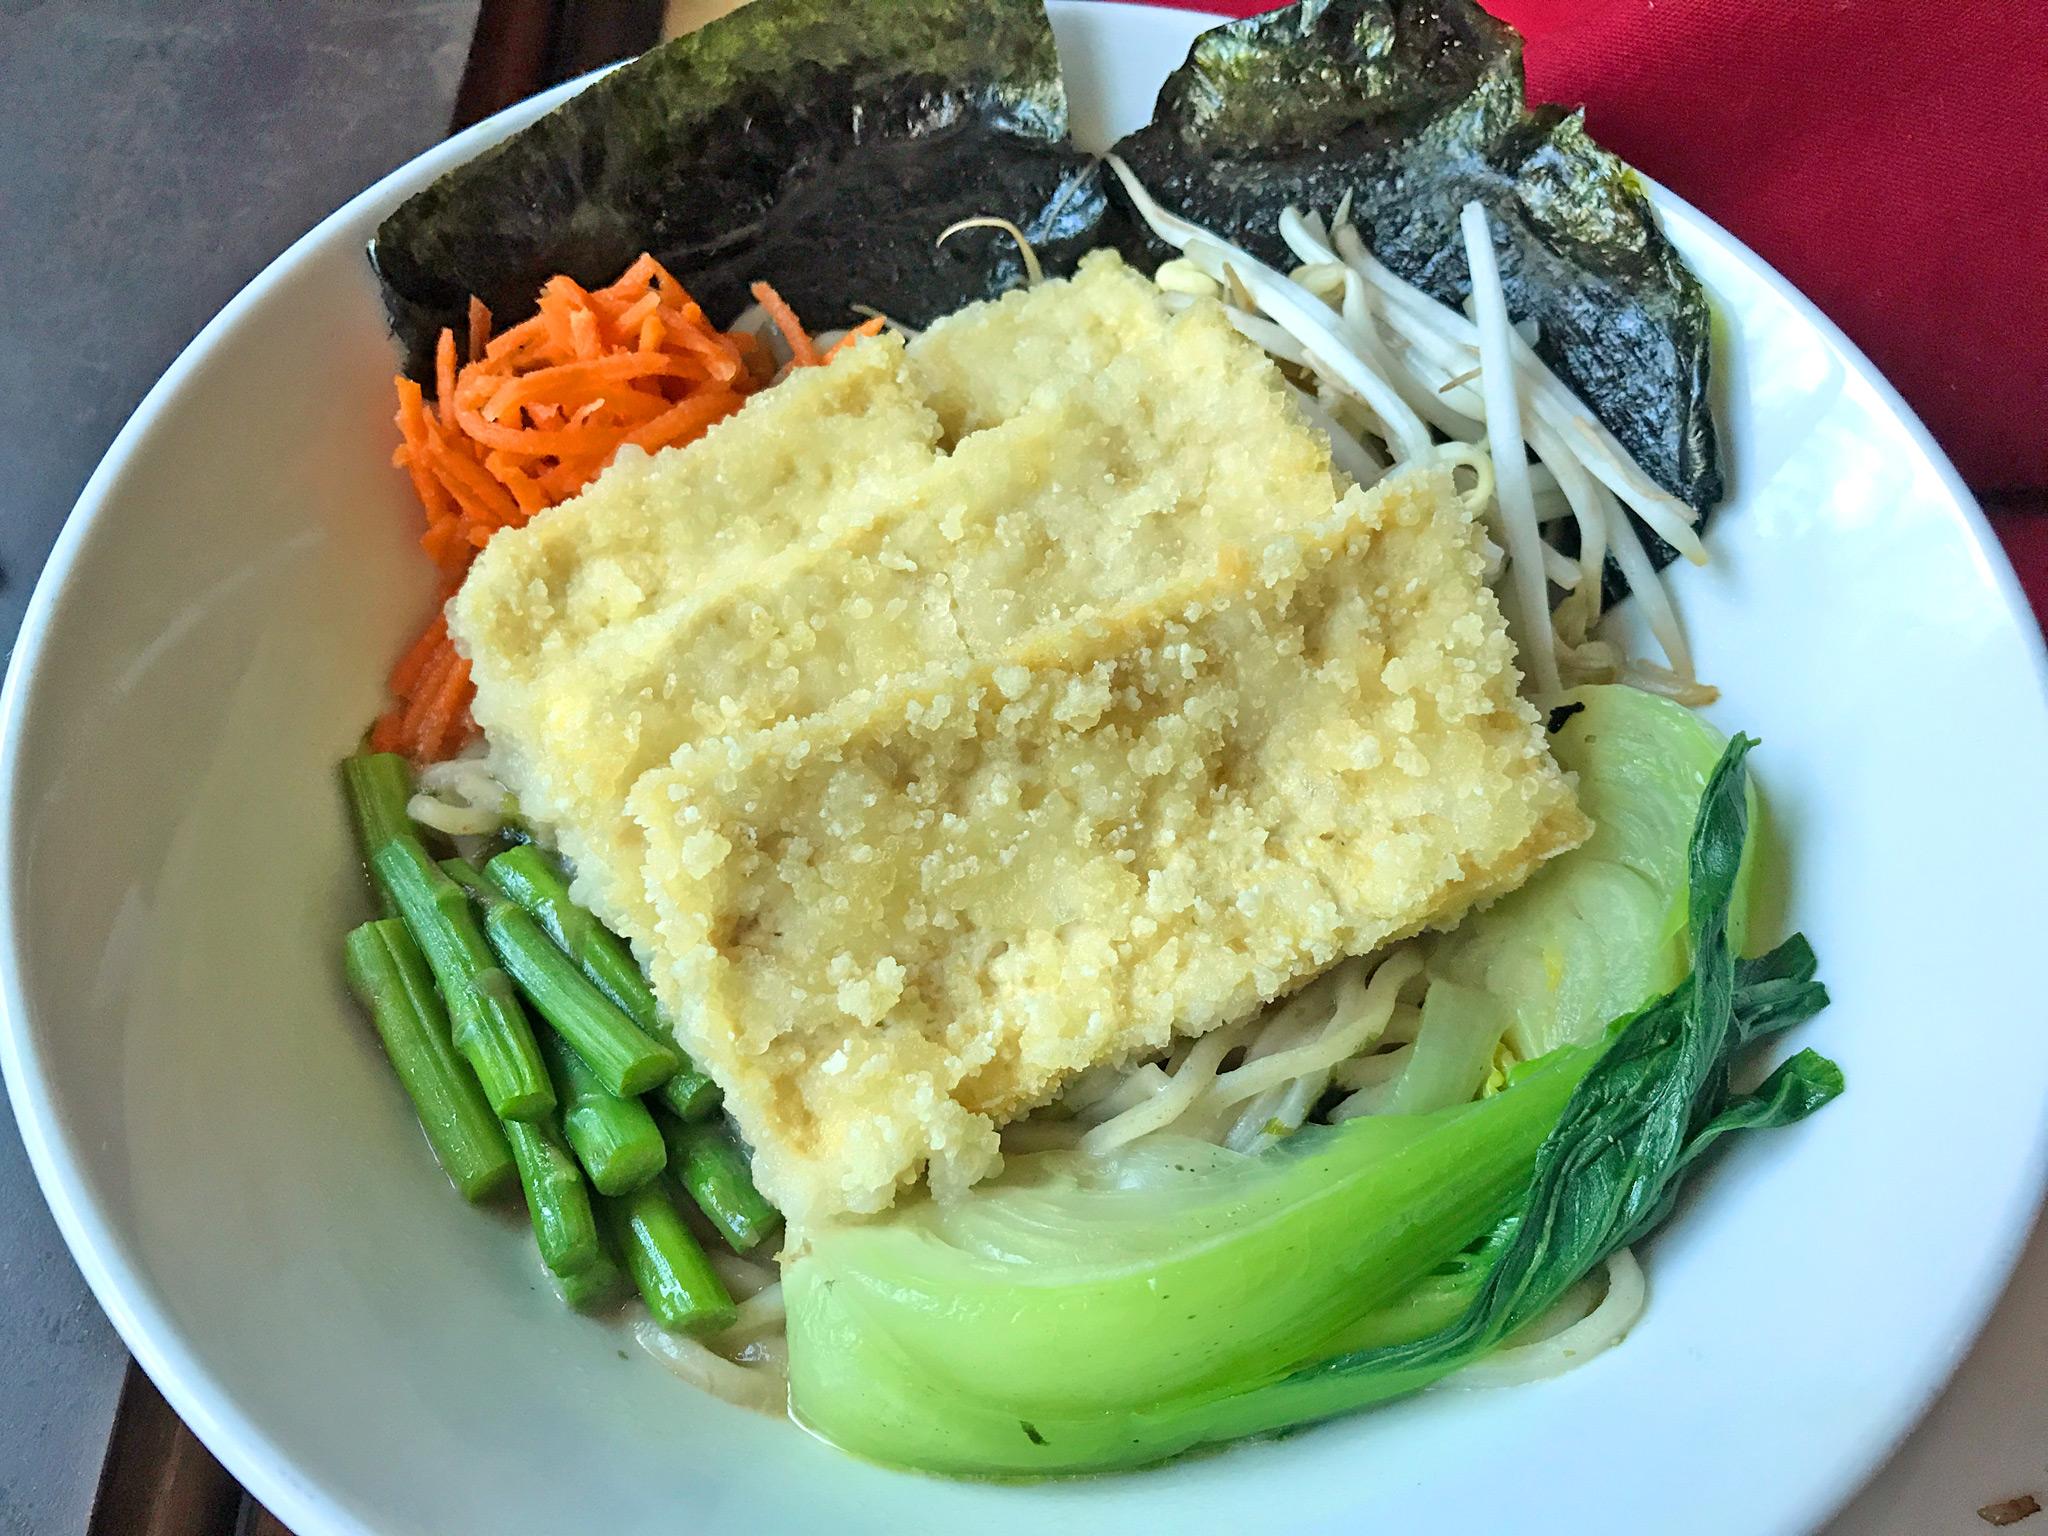 Miso Hungry Ramen - miso broth / nori seaweed / tofu croutons / asparagus / enoki mushrooms